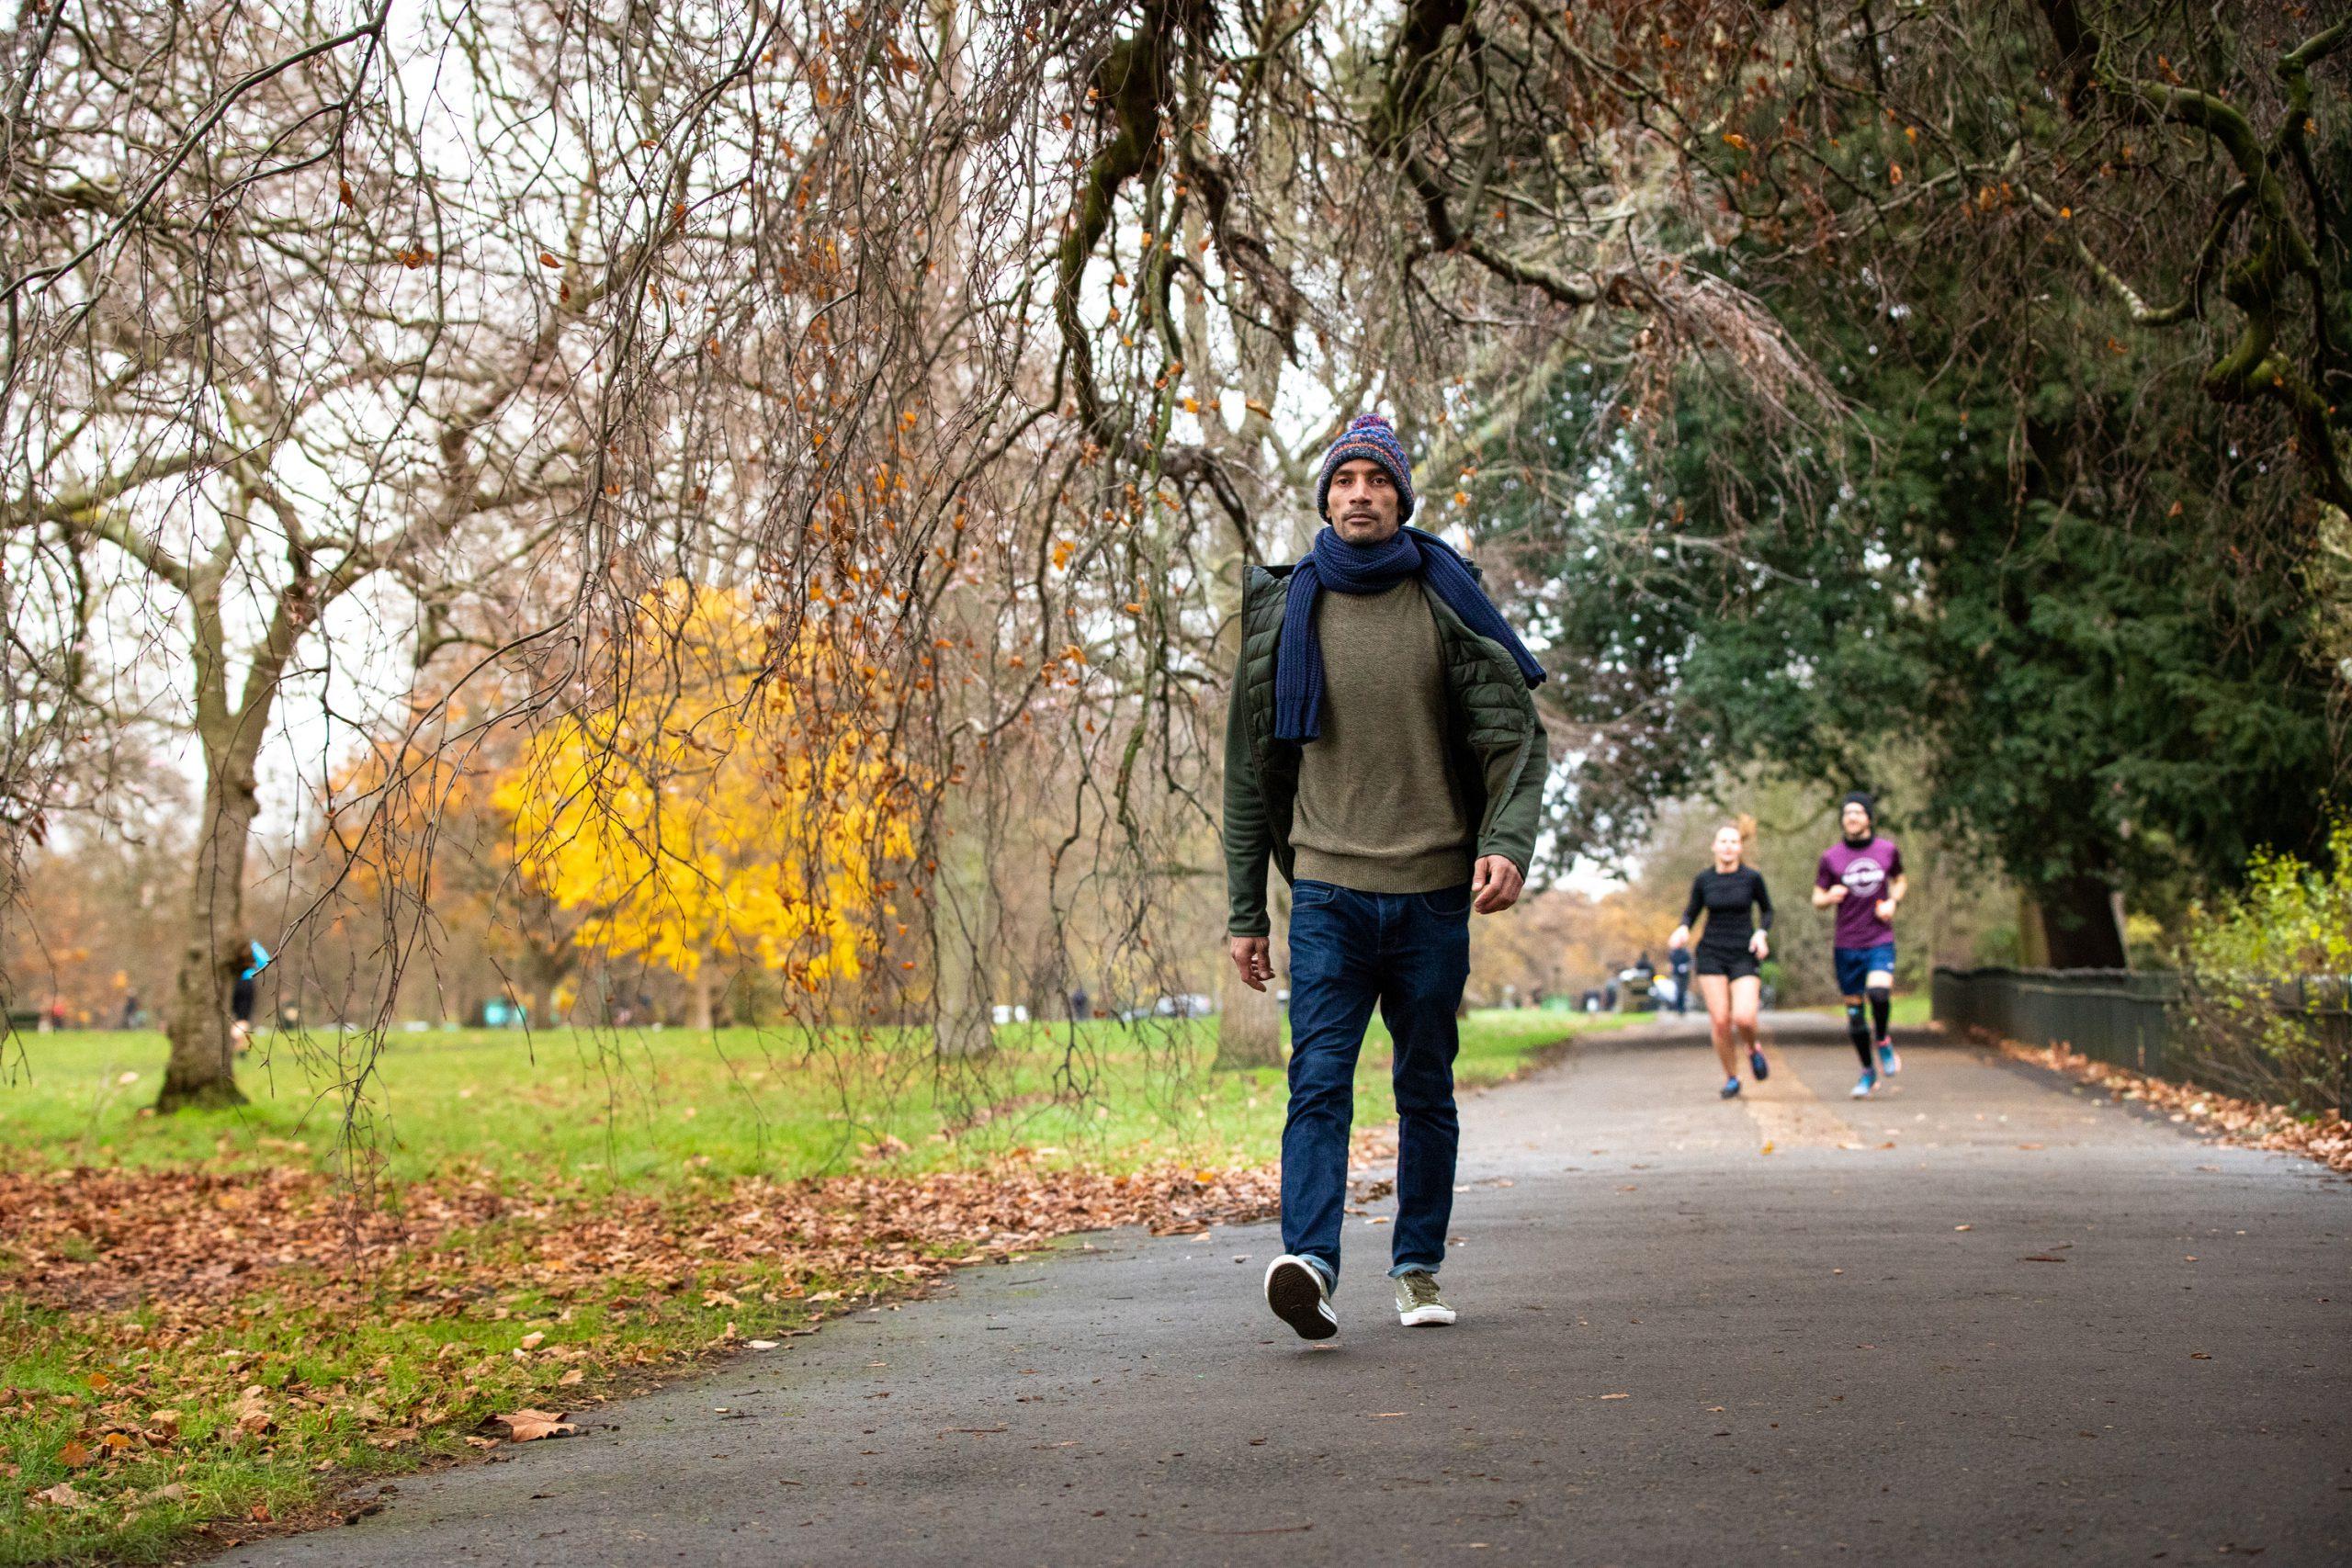 A man walks to work through a park in London.